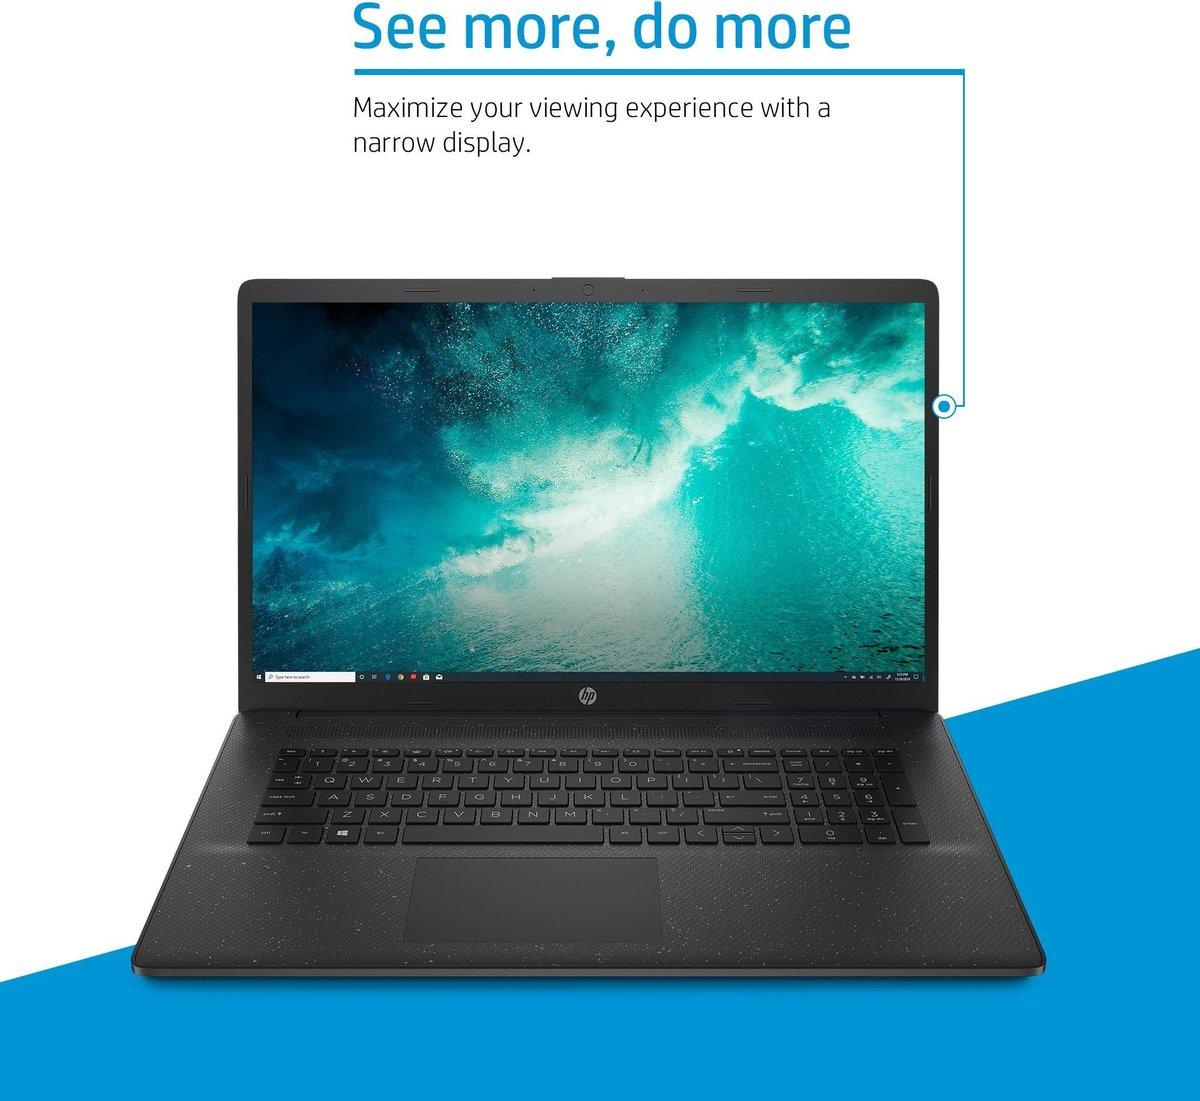 "HP 17-cn0170nd DDR4-SDRAM Notebook 43,9 cm (17.3"") 1920 x 1080 Pixels Intel® 11de generatie Core™ i3 8 GB 512 GB SSD Wi-Fi 5 (802.11ac) Windows 10 Home Zilver"